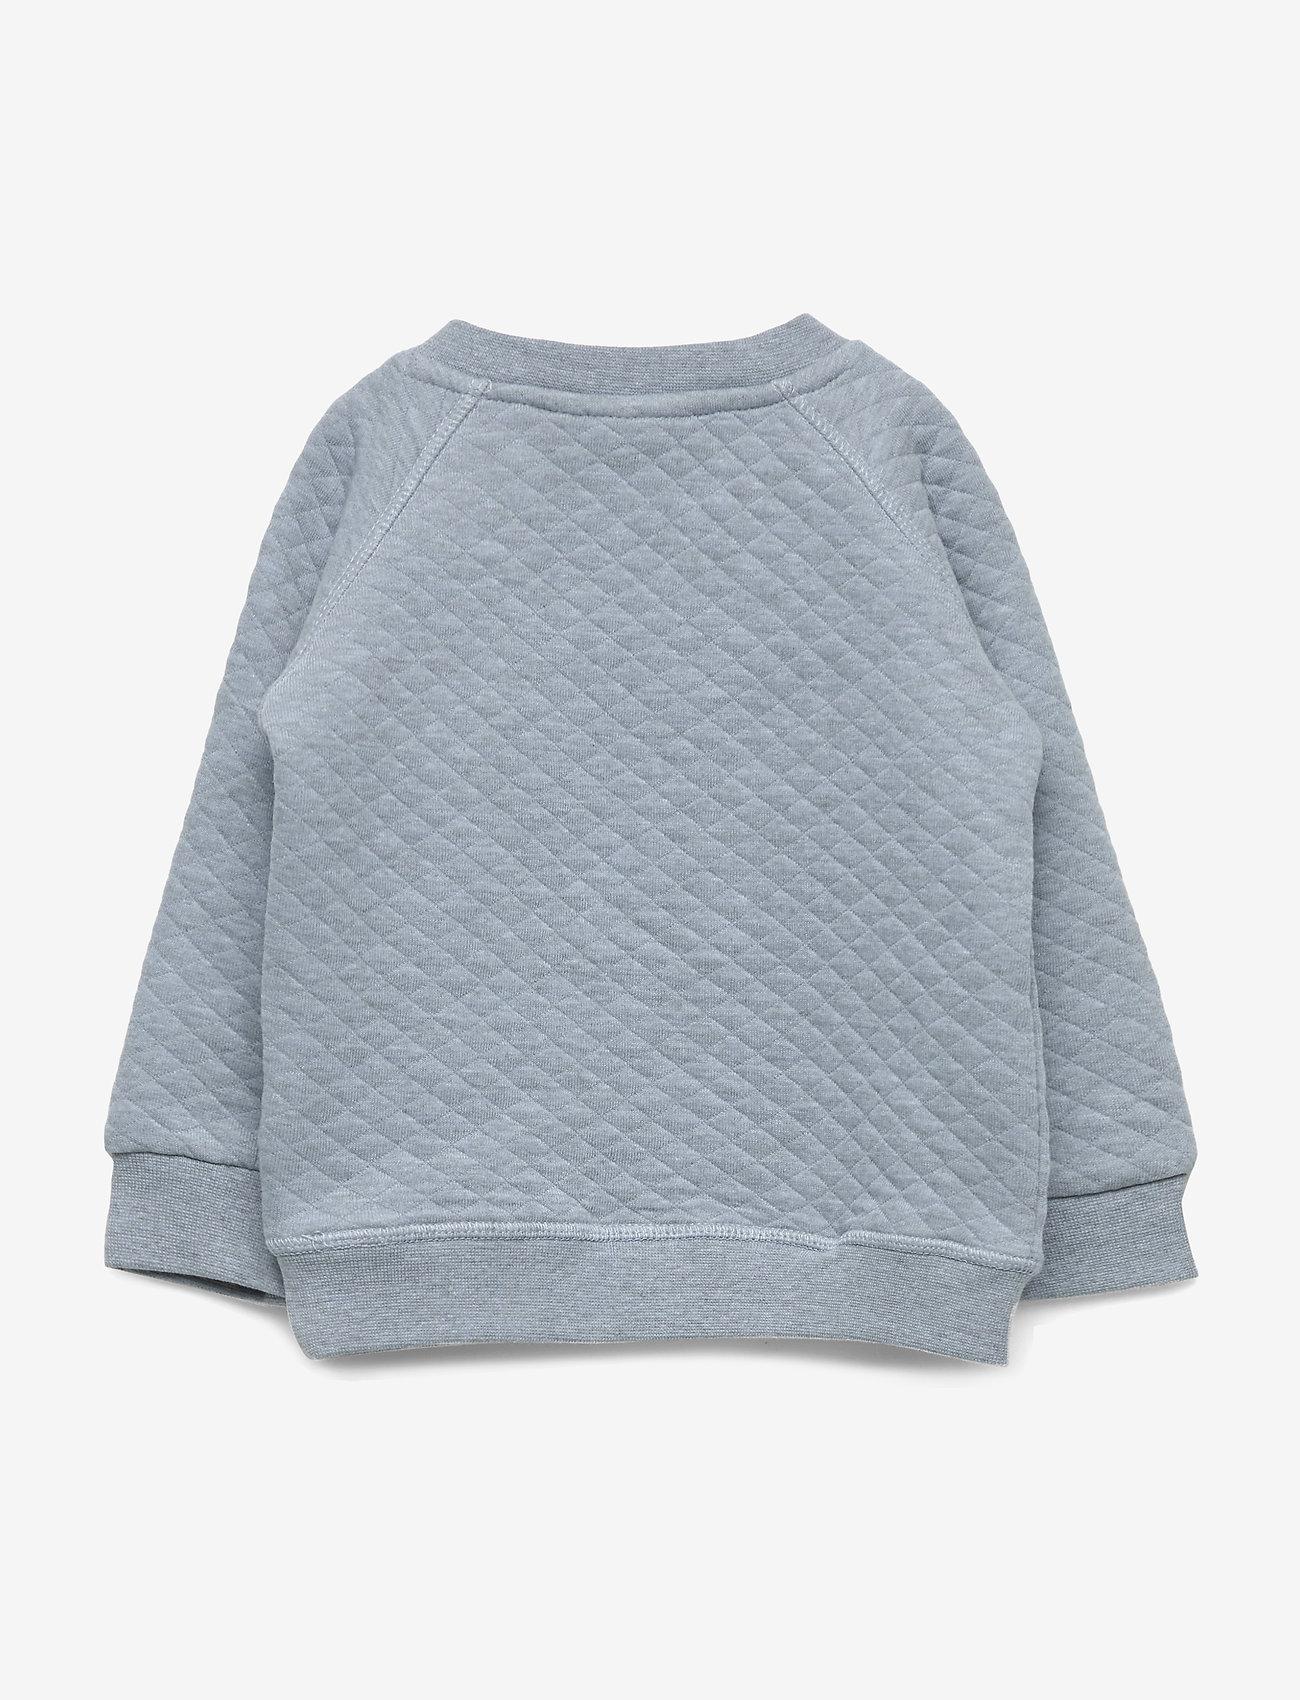 Petit by Sofie Schnoor - Sweat NYC - sweatshirts - light blue melange - 1